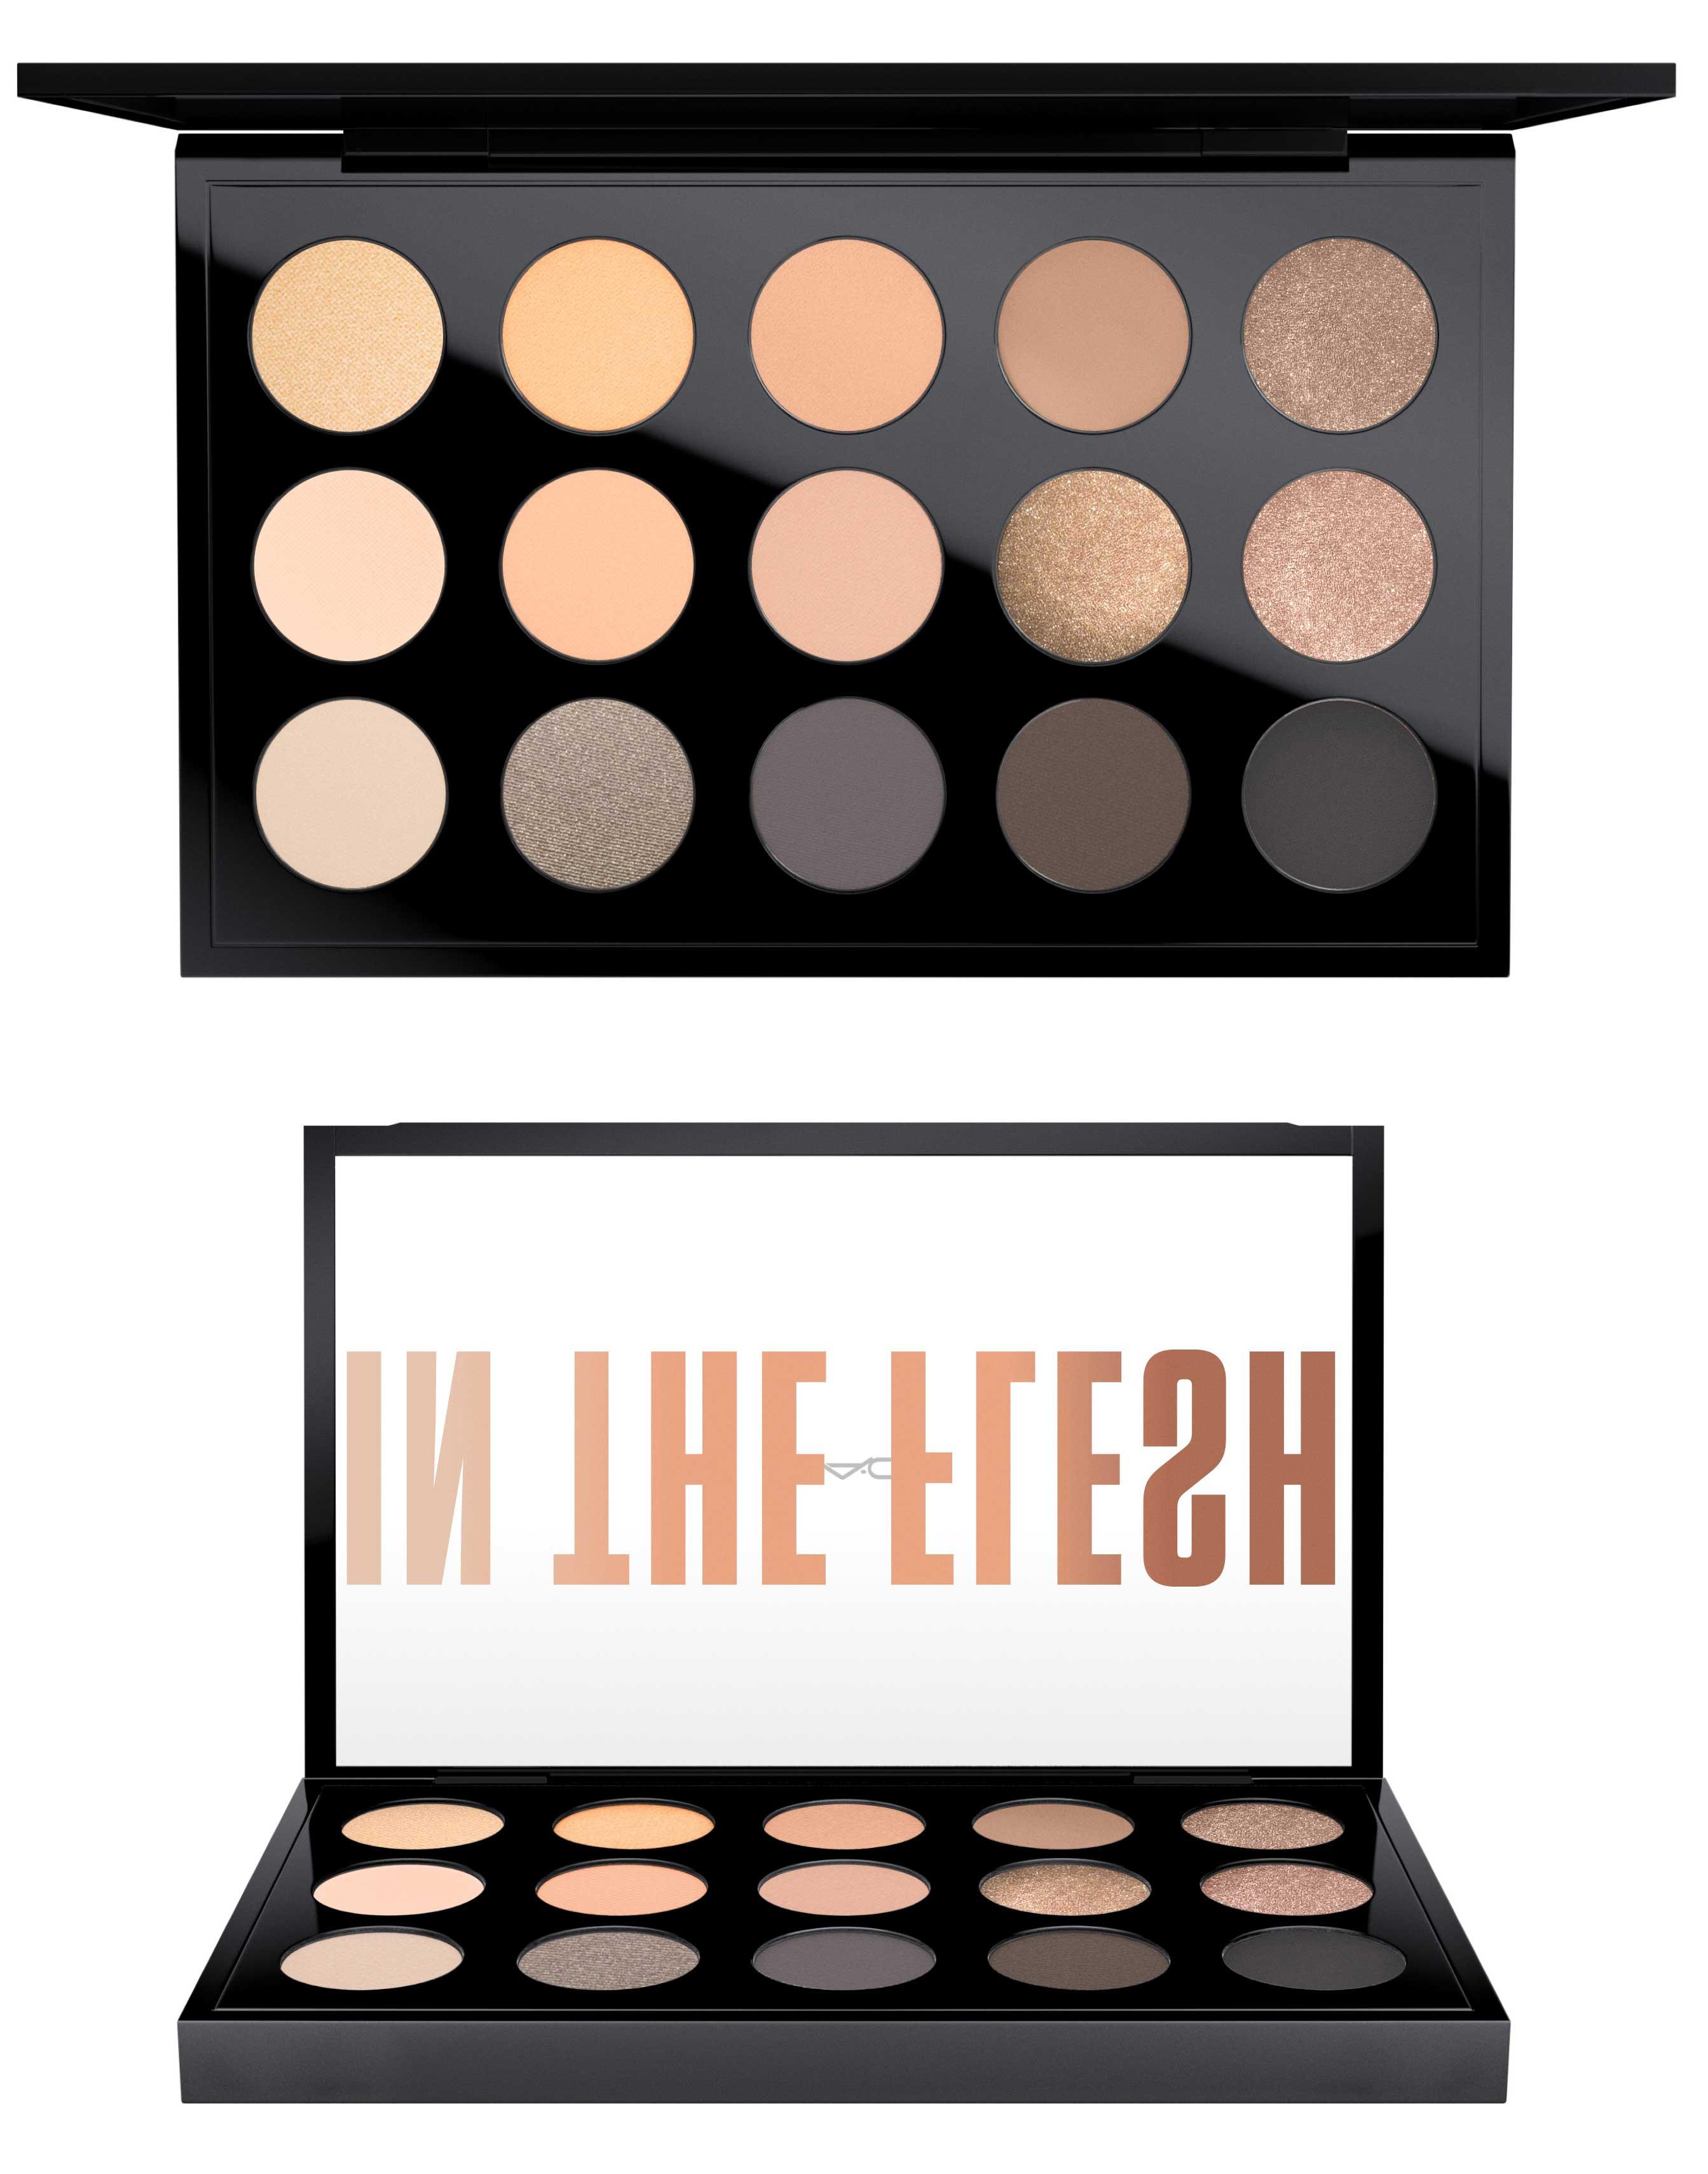 Mac eye shadow x15 flesh makeup beautyalmanac brand mac thecheapjerseys Image collections